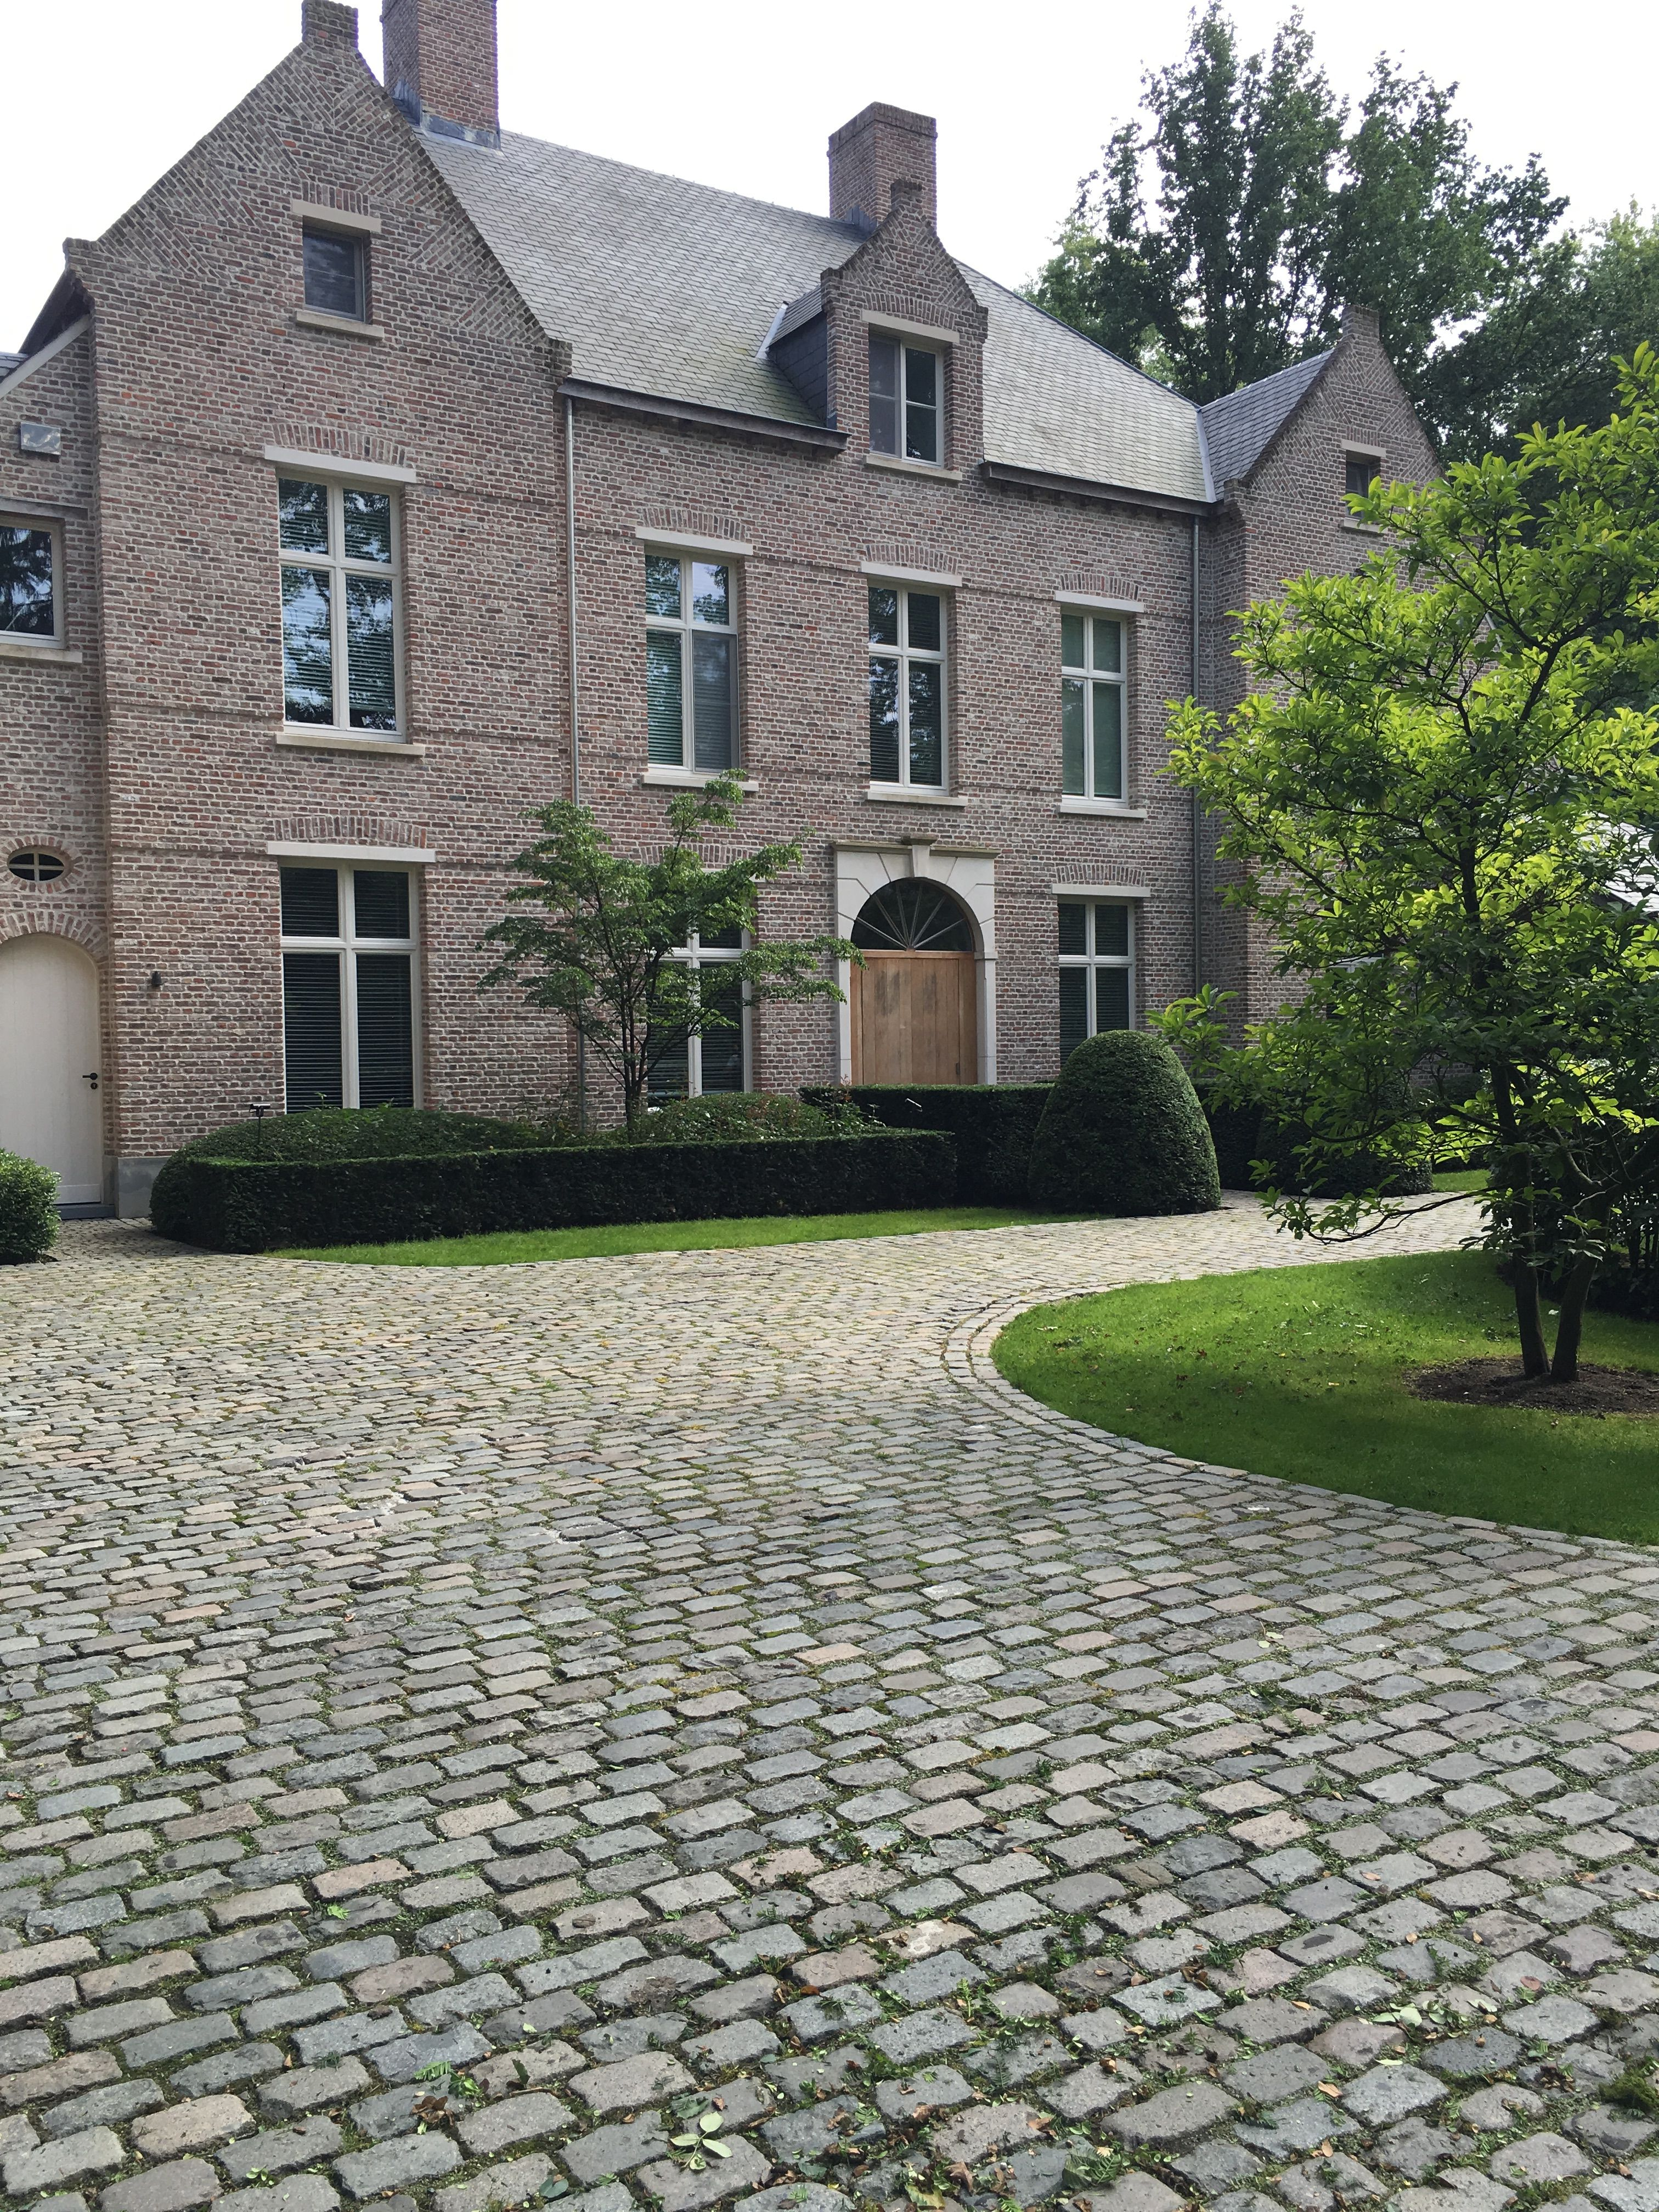 Oprit kasseien ontwerp vts tuinarchitectuur exterior for Oprit ontwerp